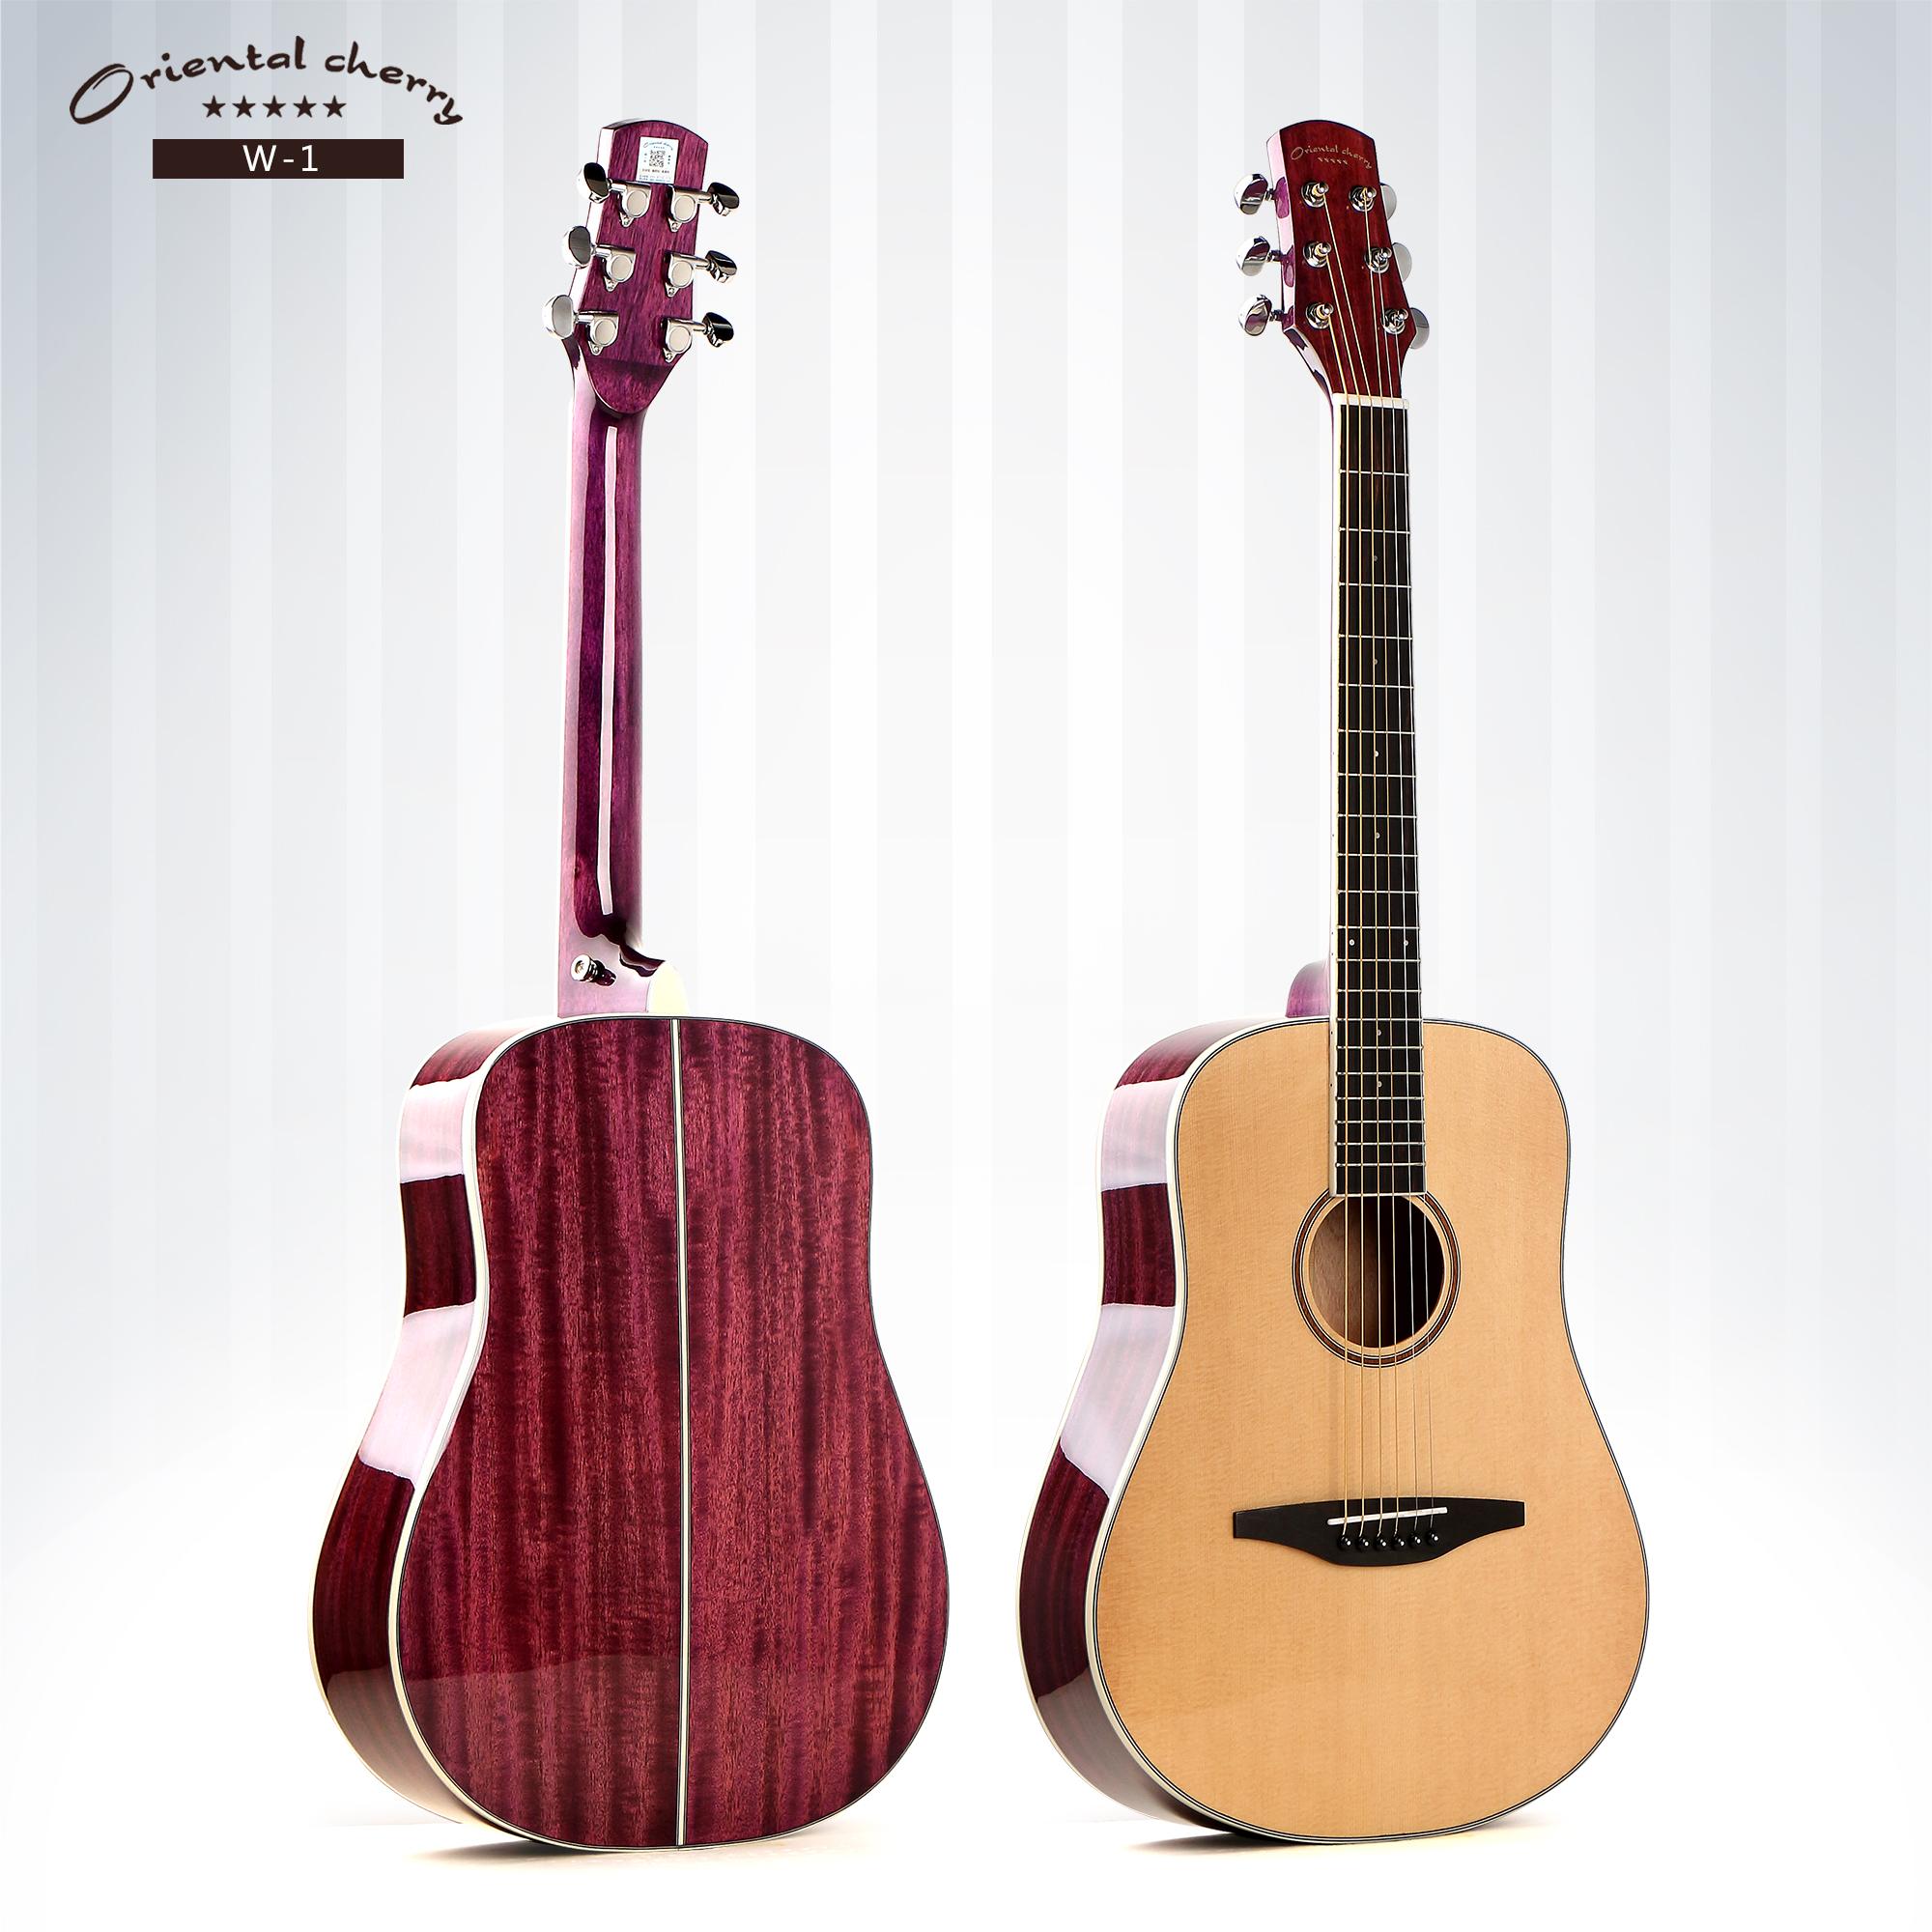 Gambar Gitar Akustik Warna Pink - Gambar Gitar